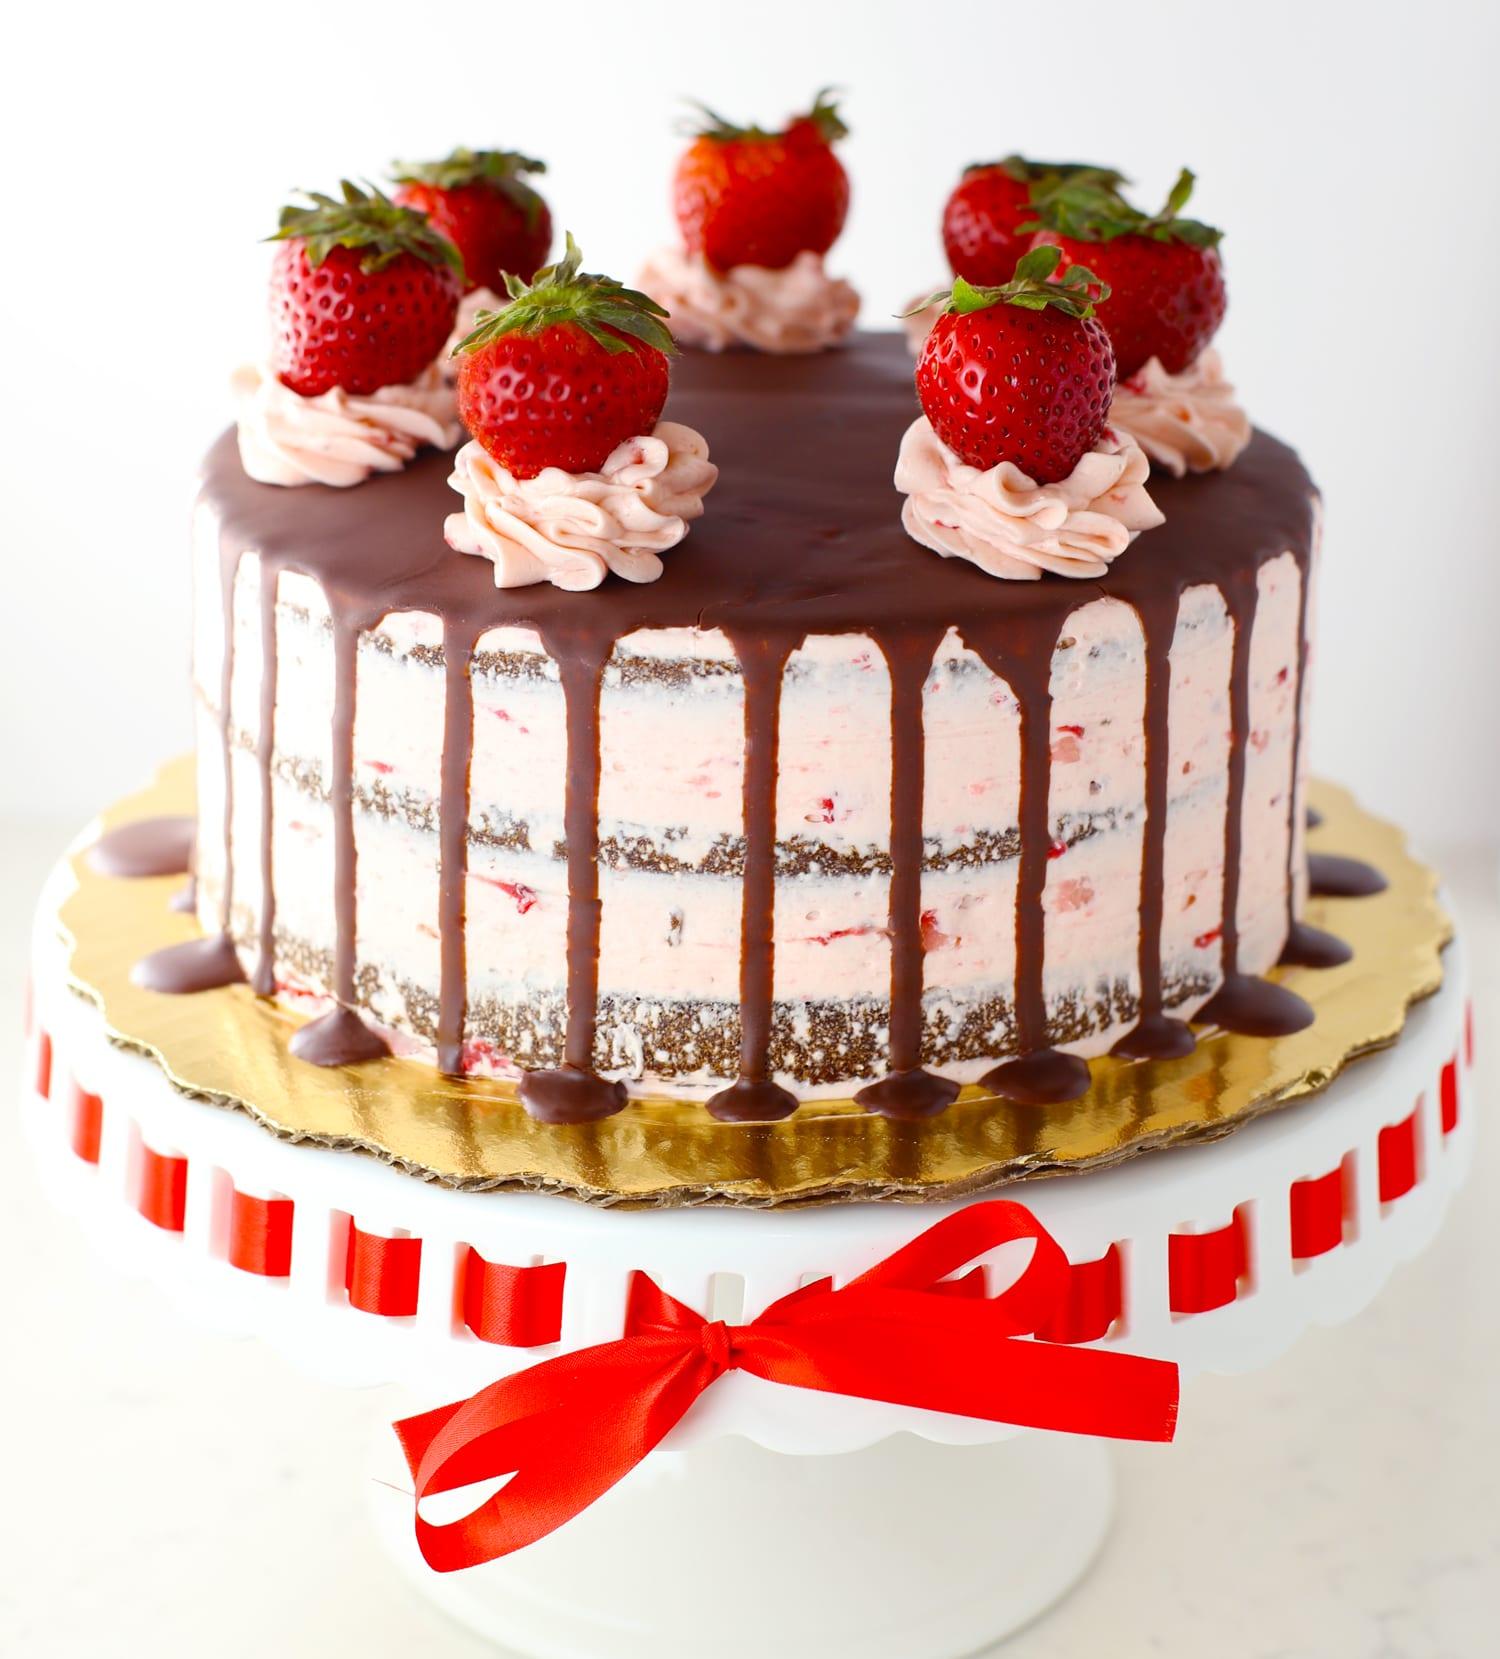 Chocolate & strawberry decor cake | Decorating Cakes ... |Strawberry Cake Decoration